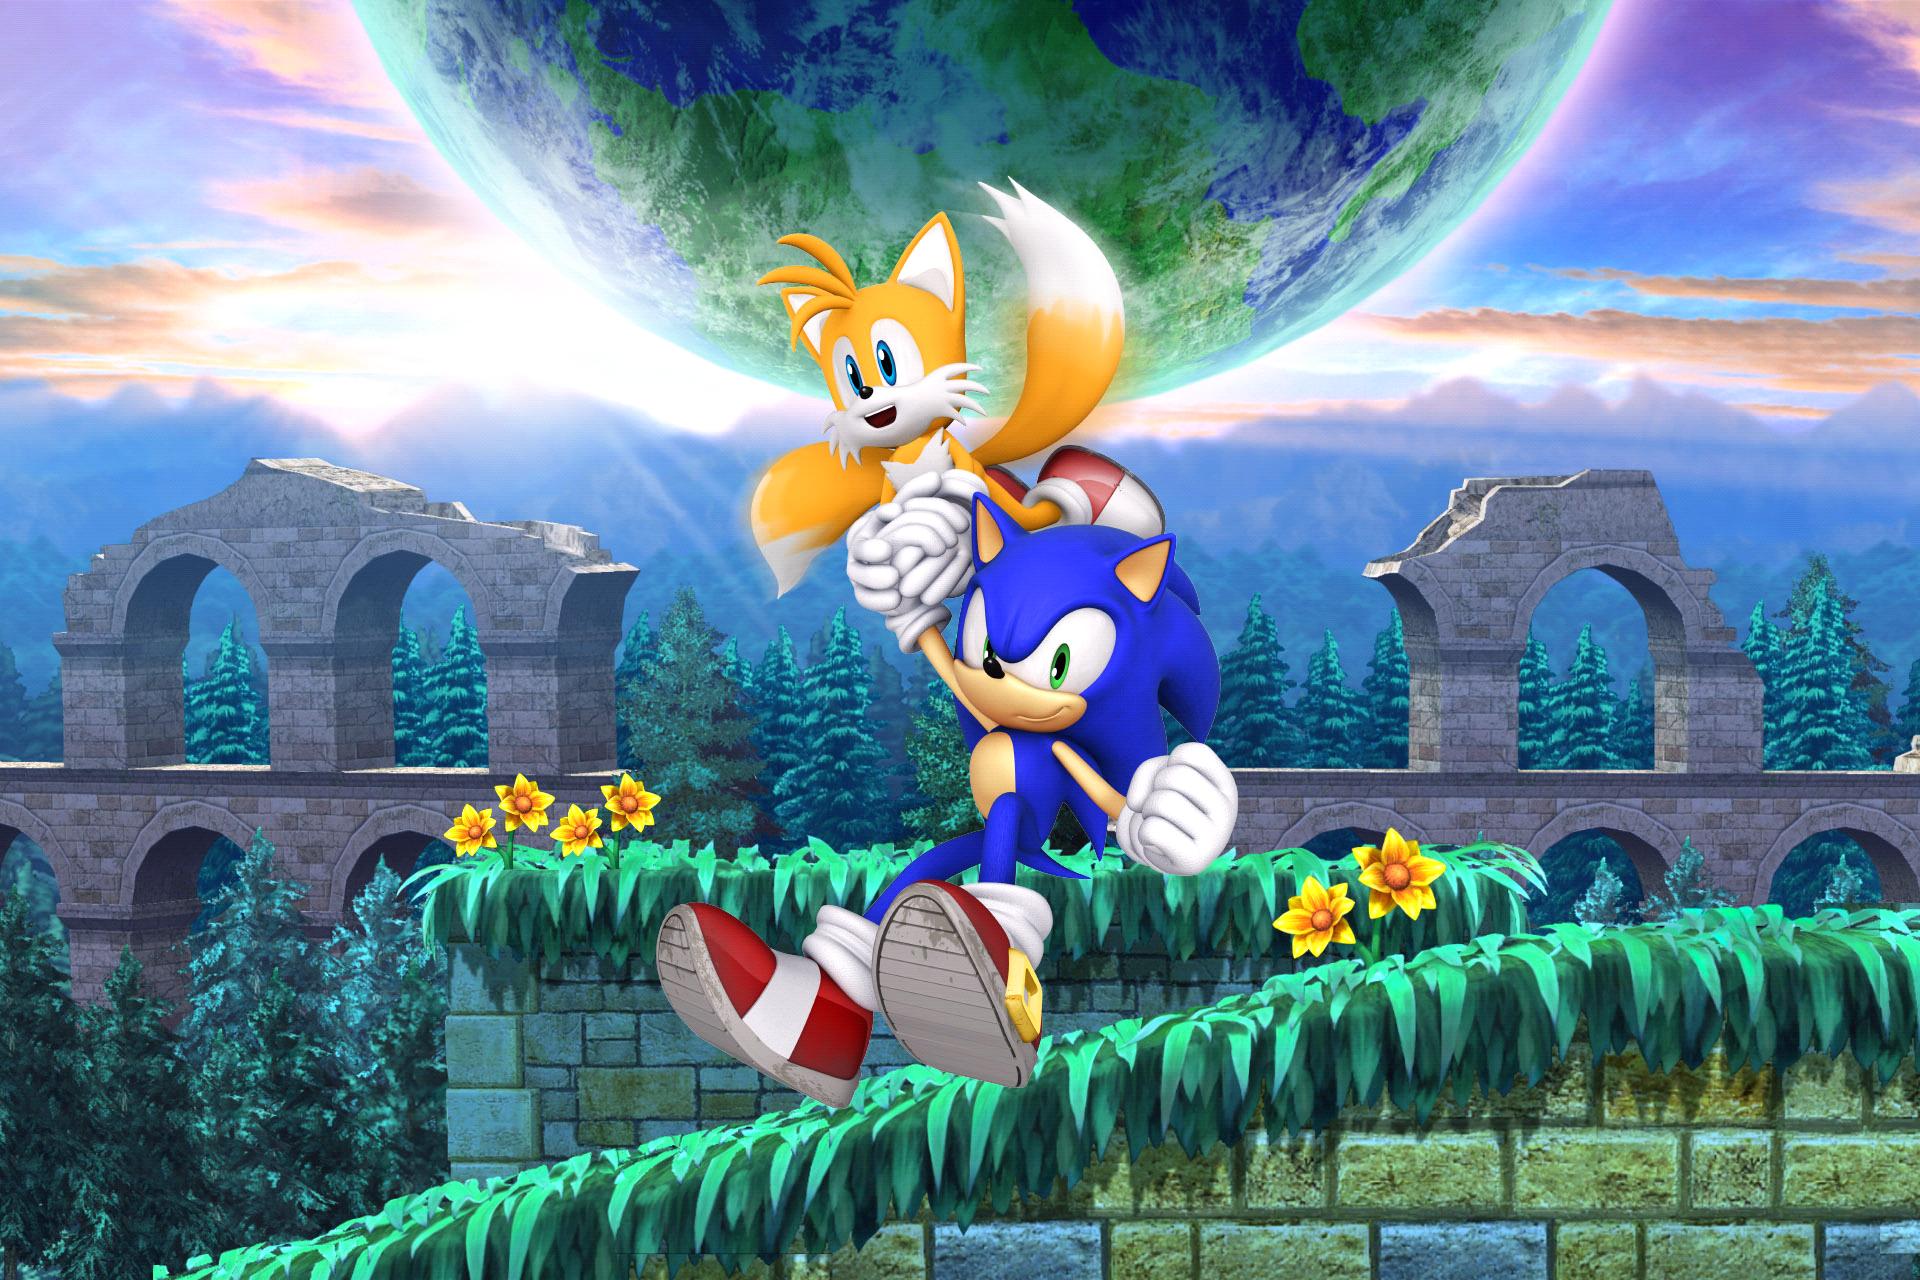 Sonic The Hedgehog 4 Episode Ii Hd Wallpaper Background Image